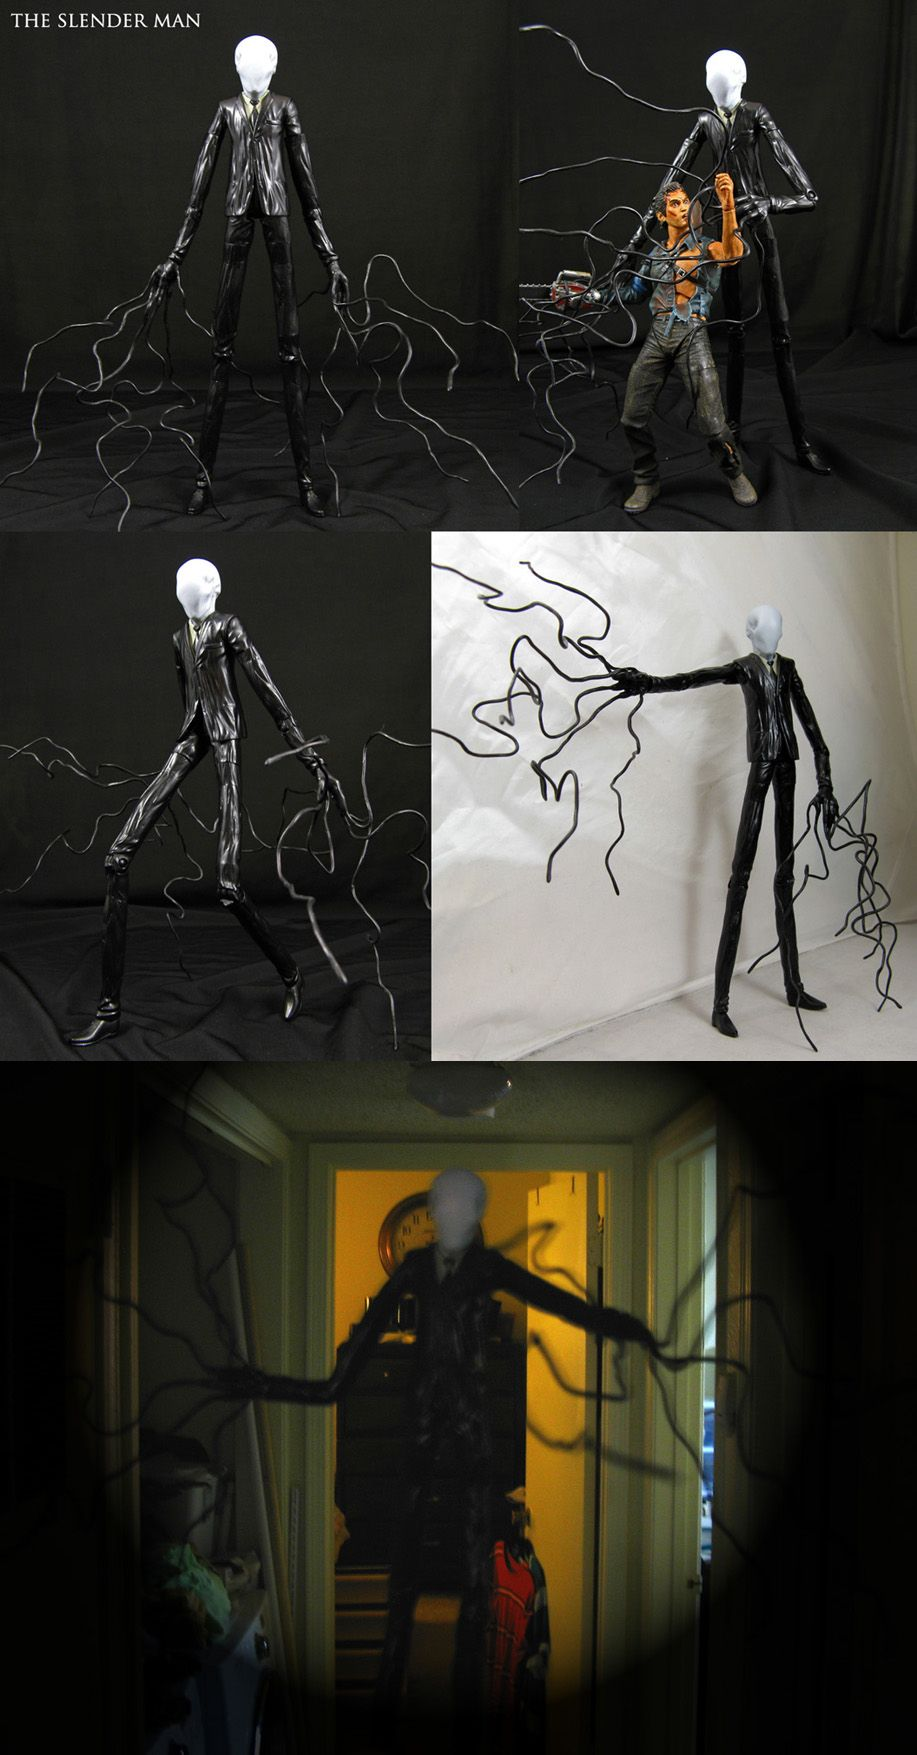 f51ce566d34 Custom Slender Man action figure by Jin-Saotome.deviantart.com on @ DeviantArt